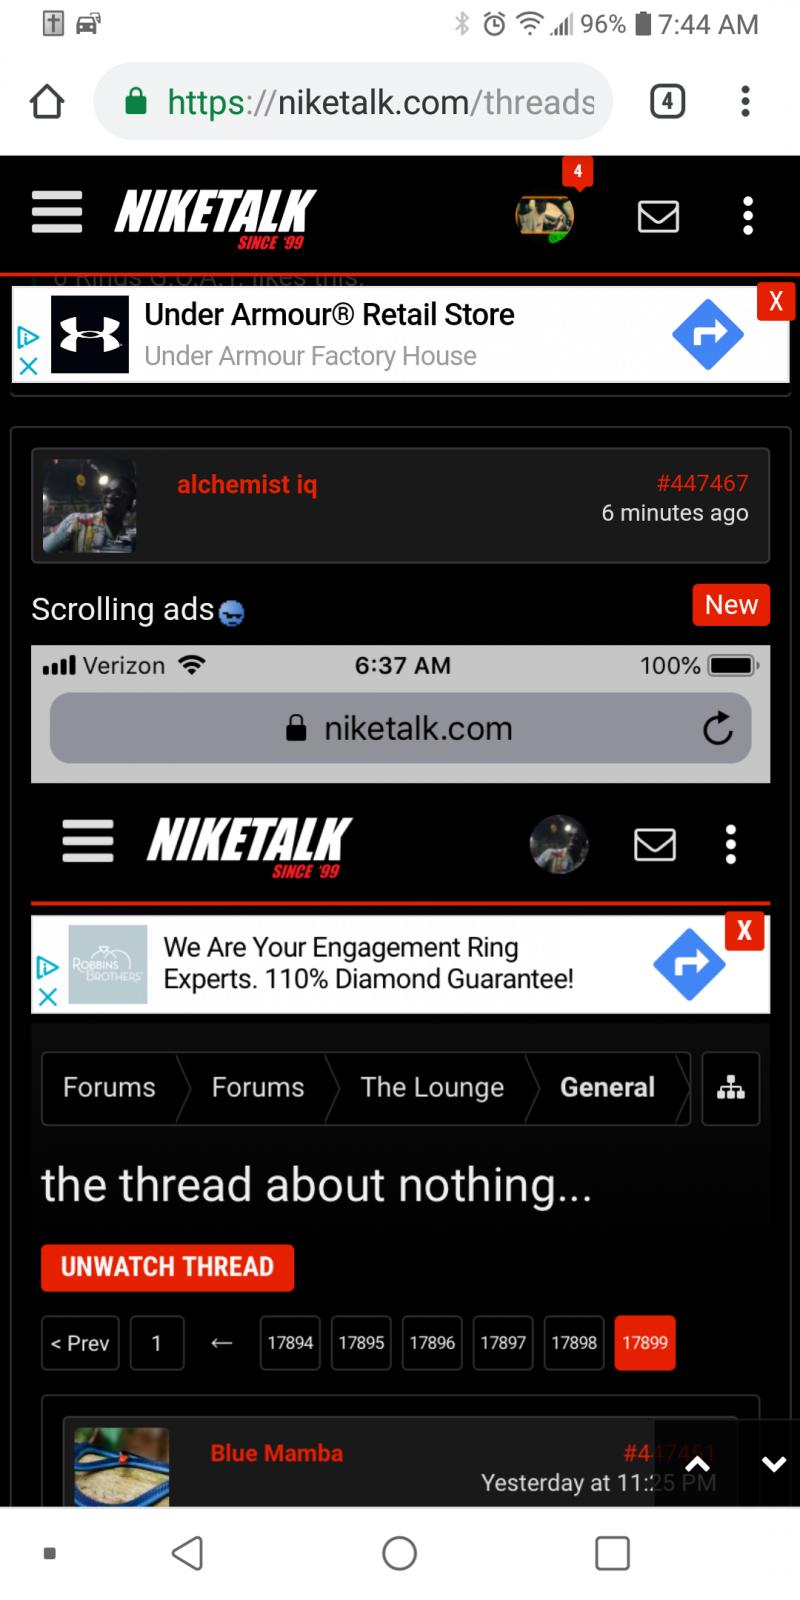 Screenshot_2019-05-09-07-44-34.png